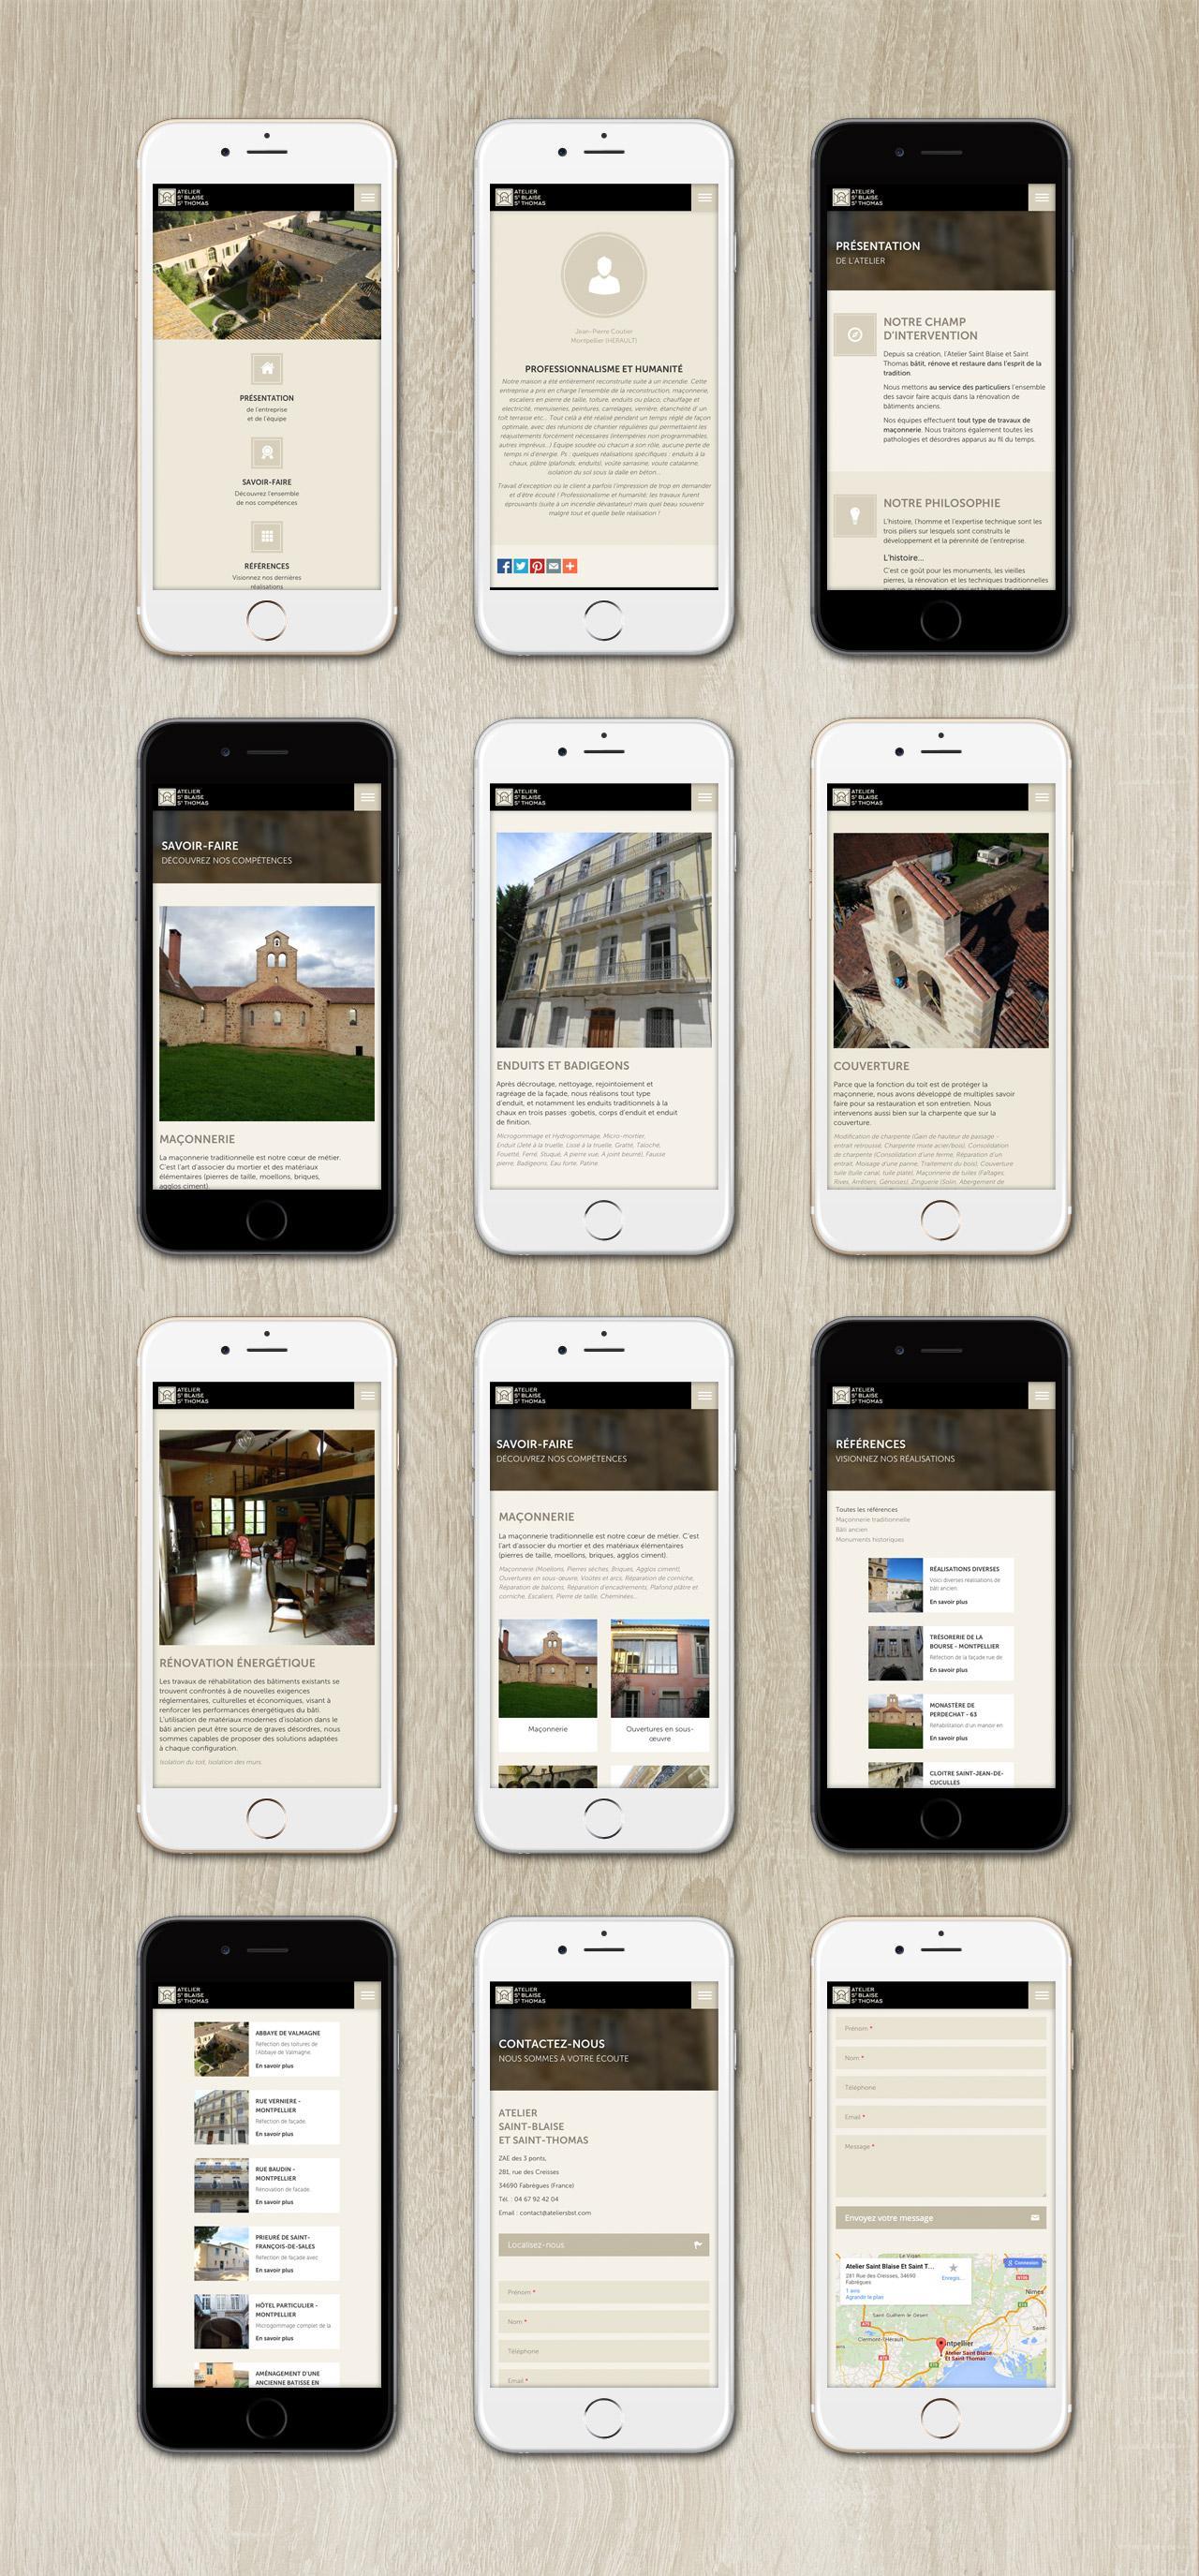 atelier-sbst-creation-site-responsive-design-mobile-hemerastudio-alexis-cretin-graphiste